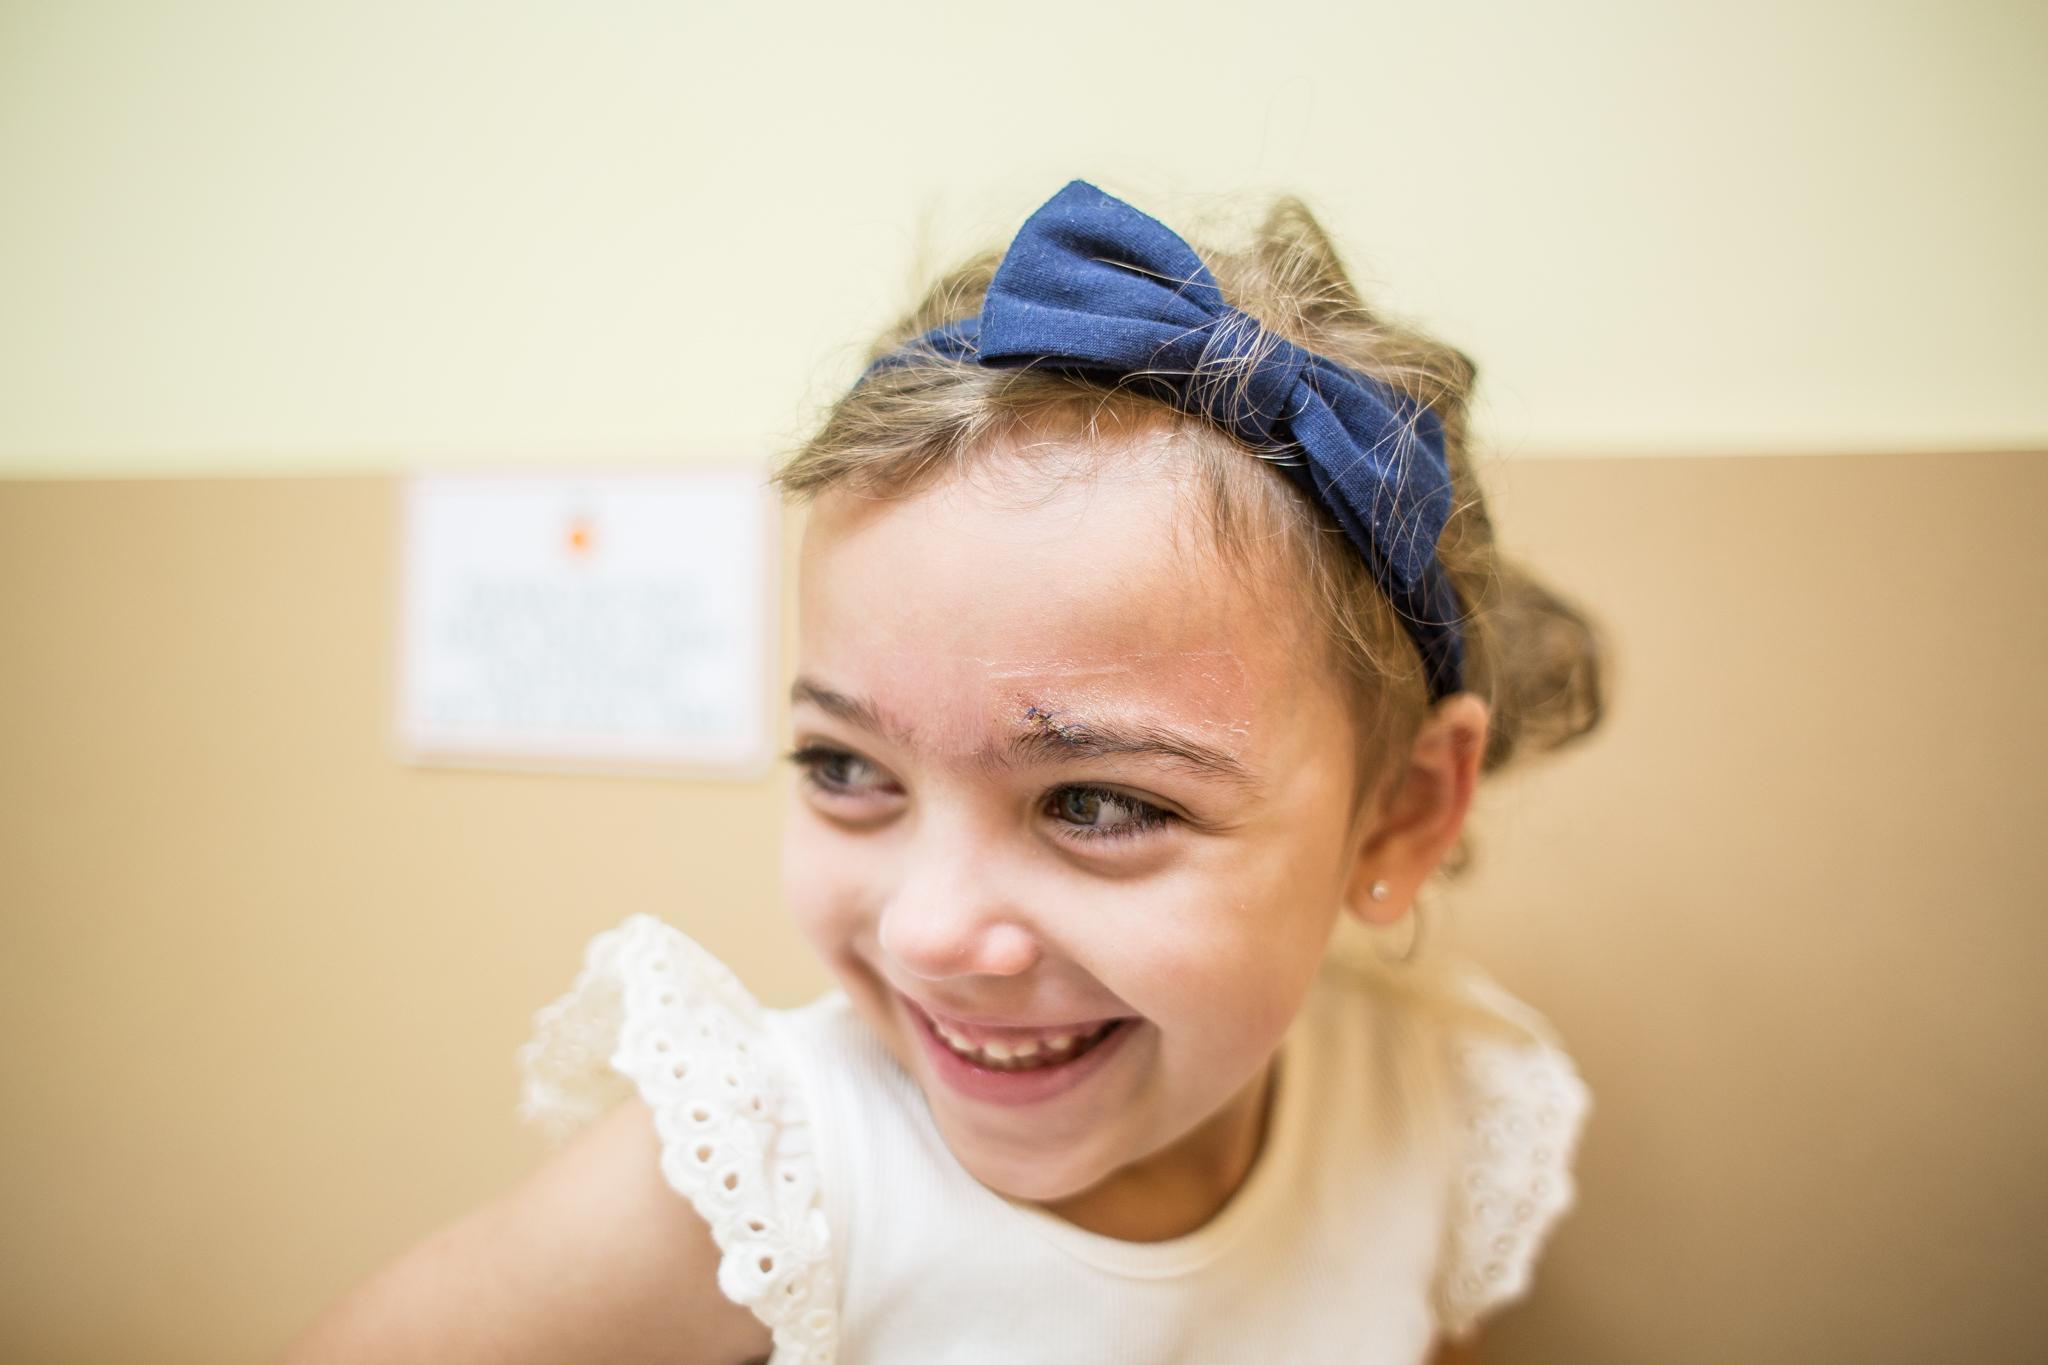 pediatric associates coral springs child photographer.jpg